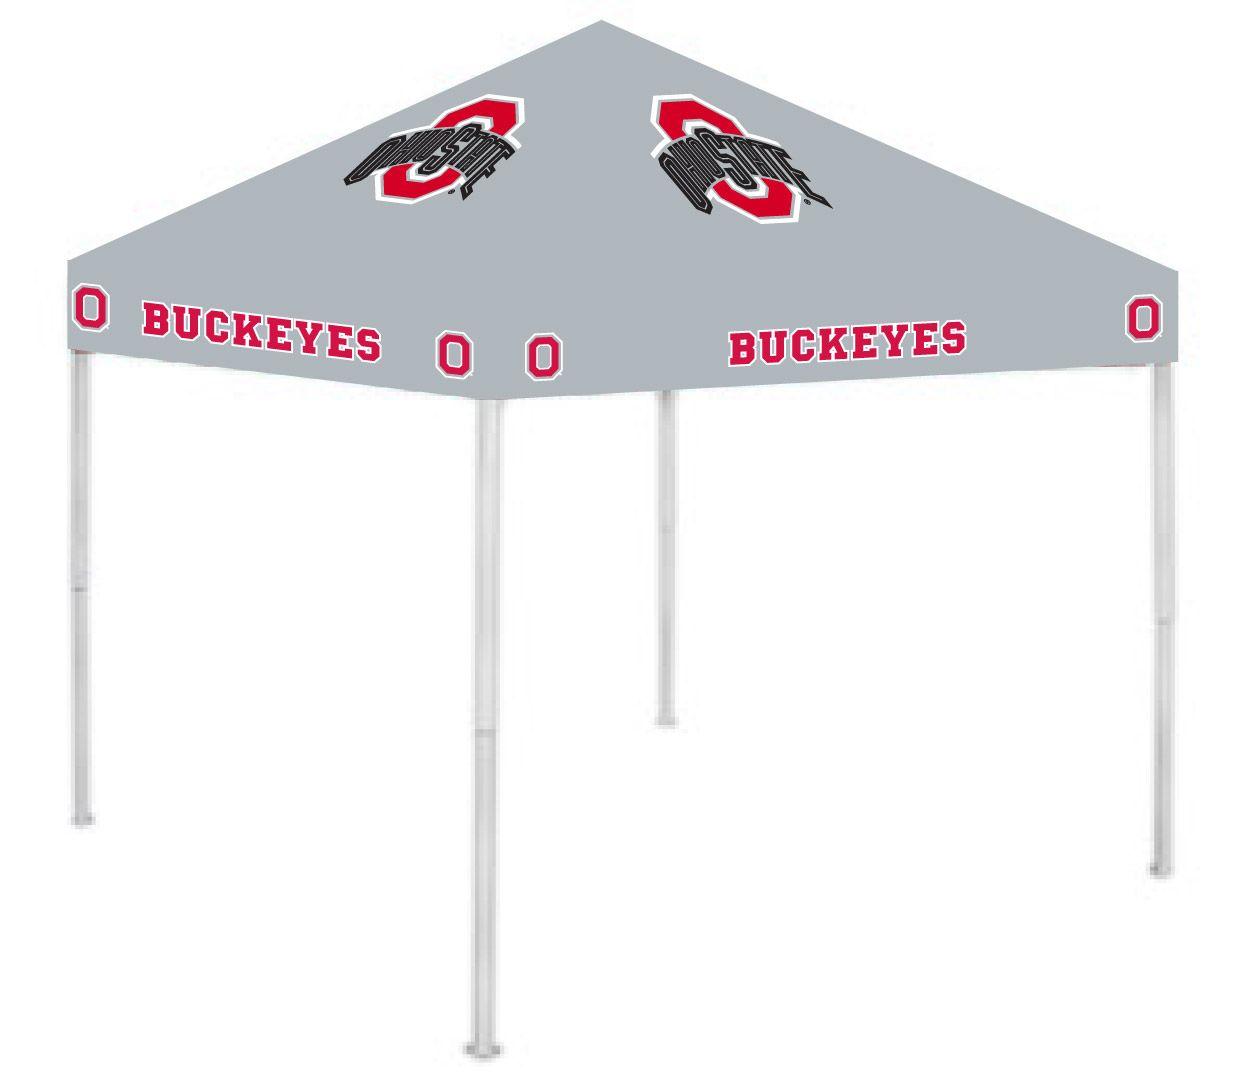 Ohio State Buckeyes NCAA 9u0027 x 9u0027 Ultimate Tailgate Pop-Up Canopy Tent  sc 1 st  Pinterest & Ohio State Buckeyes NCAA 9u0027 x 9u0027 Ultimate Tailgate Pop-Up Canopy ...